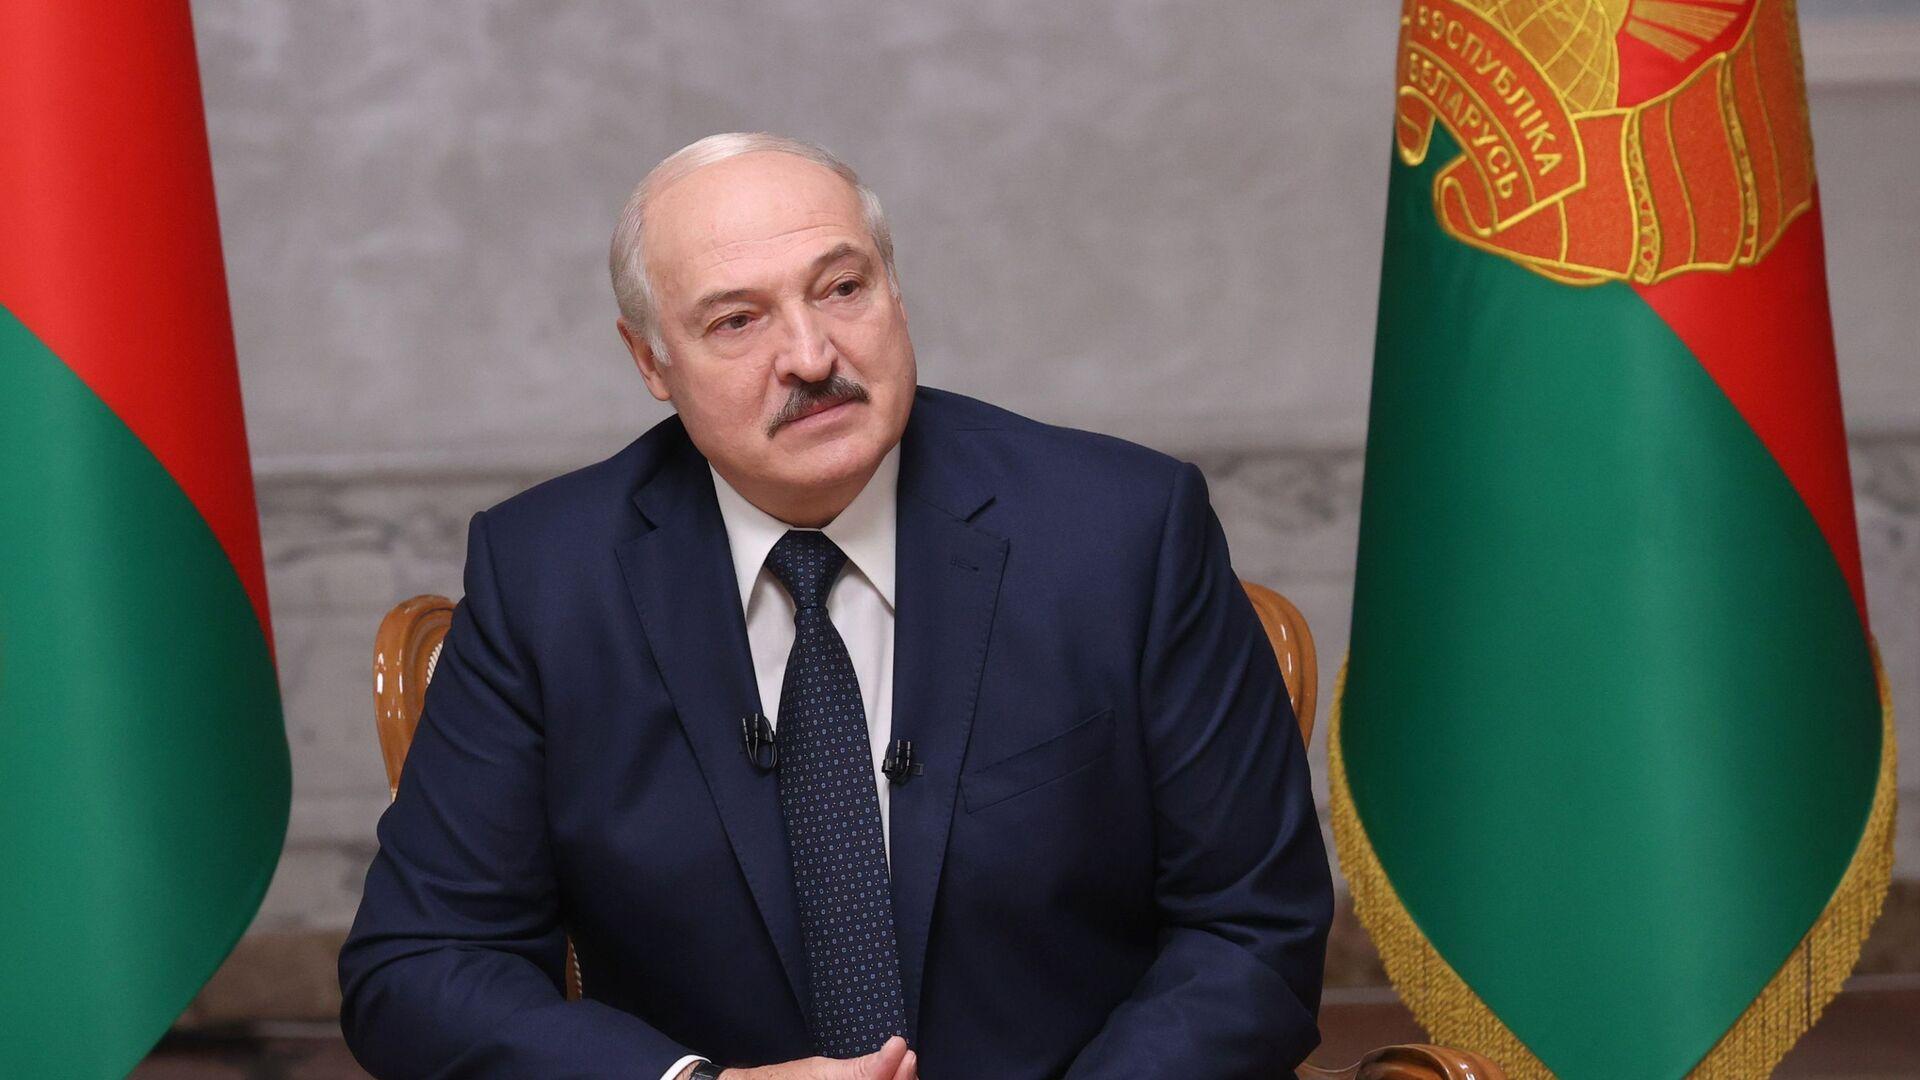 Президент Белоруссии А. Лукашенко дал интервью российским журналистам - Sputnik Таджикистан, 1920, 20.09.2021